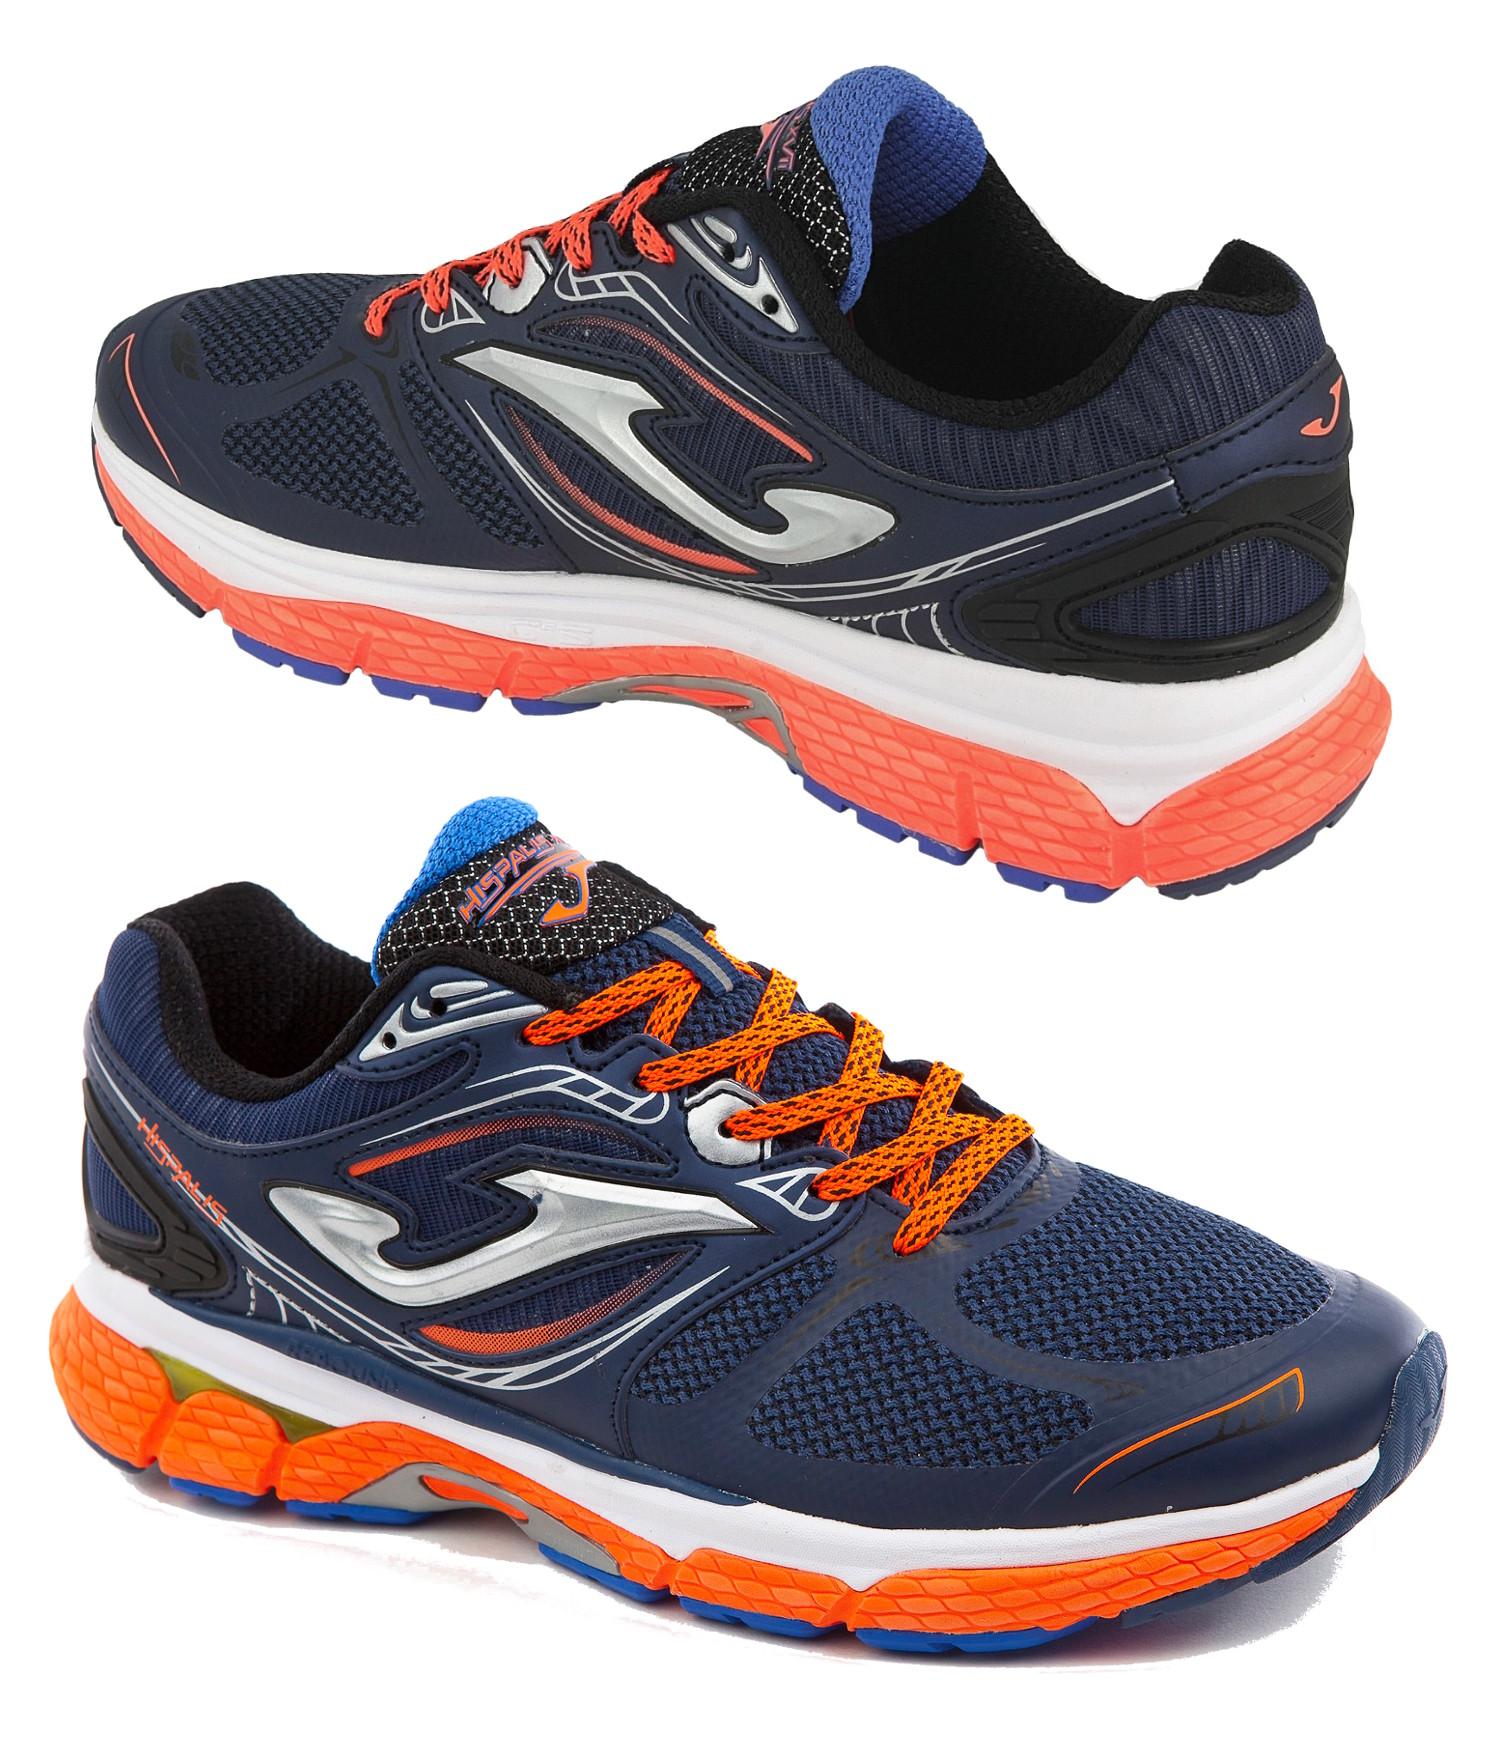 Joma Scarpe Corsa Running Shoes  Trainers HISPALIS Blu 803